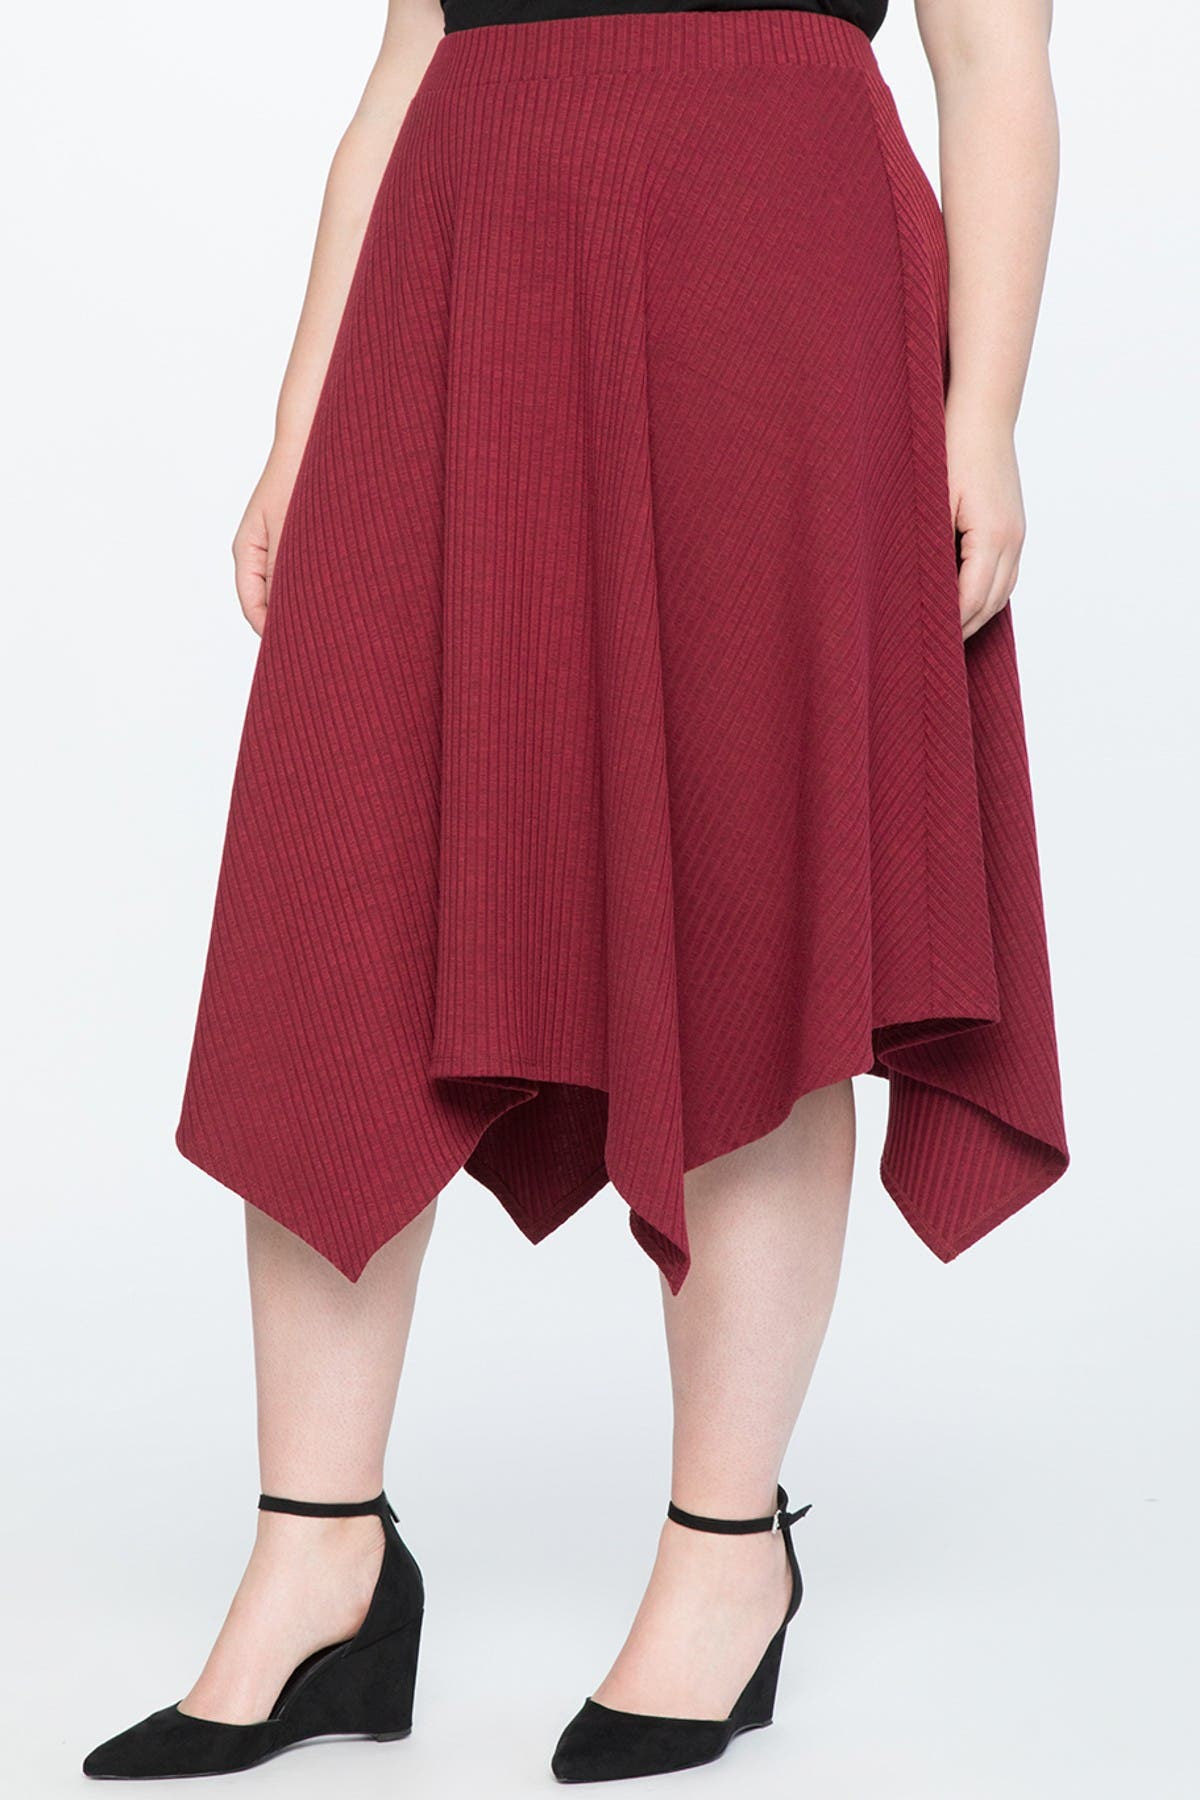 Image of ELOQUII Handkerchief Hem Ribbed Knit Midi Skirt